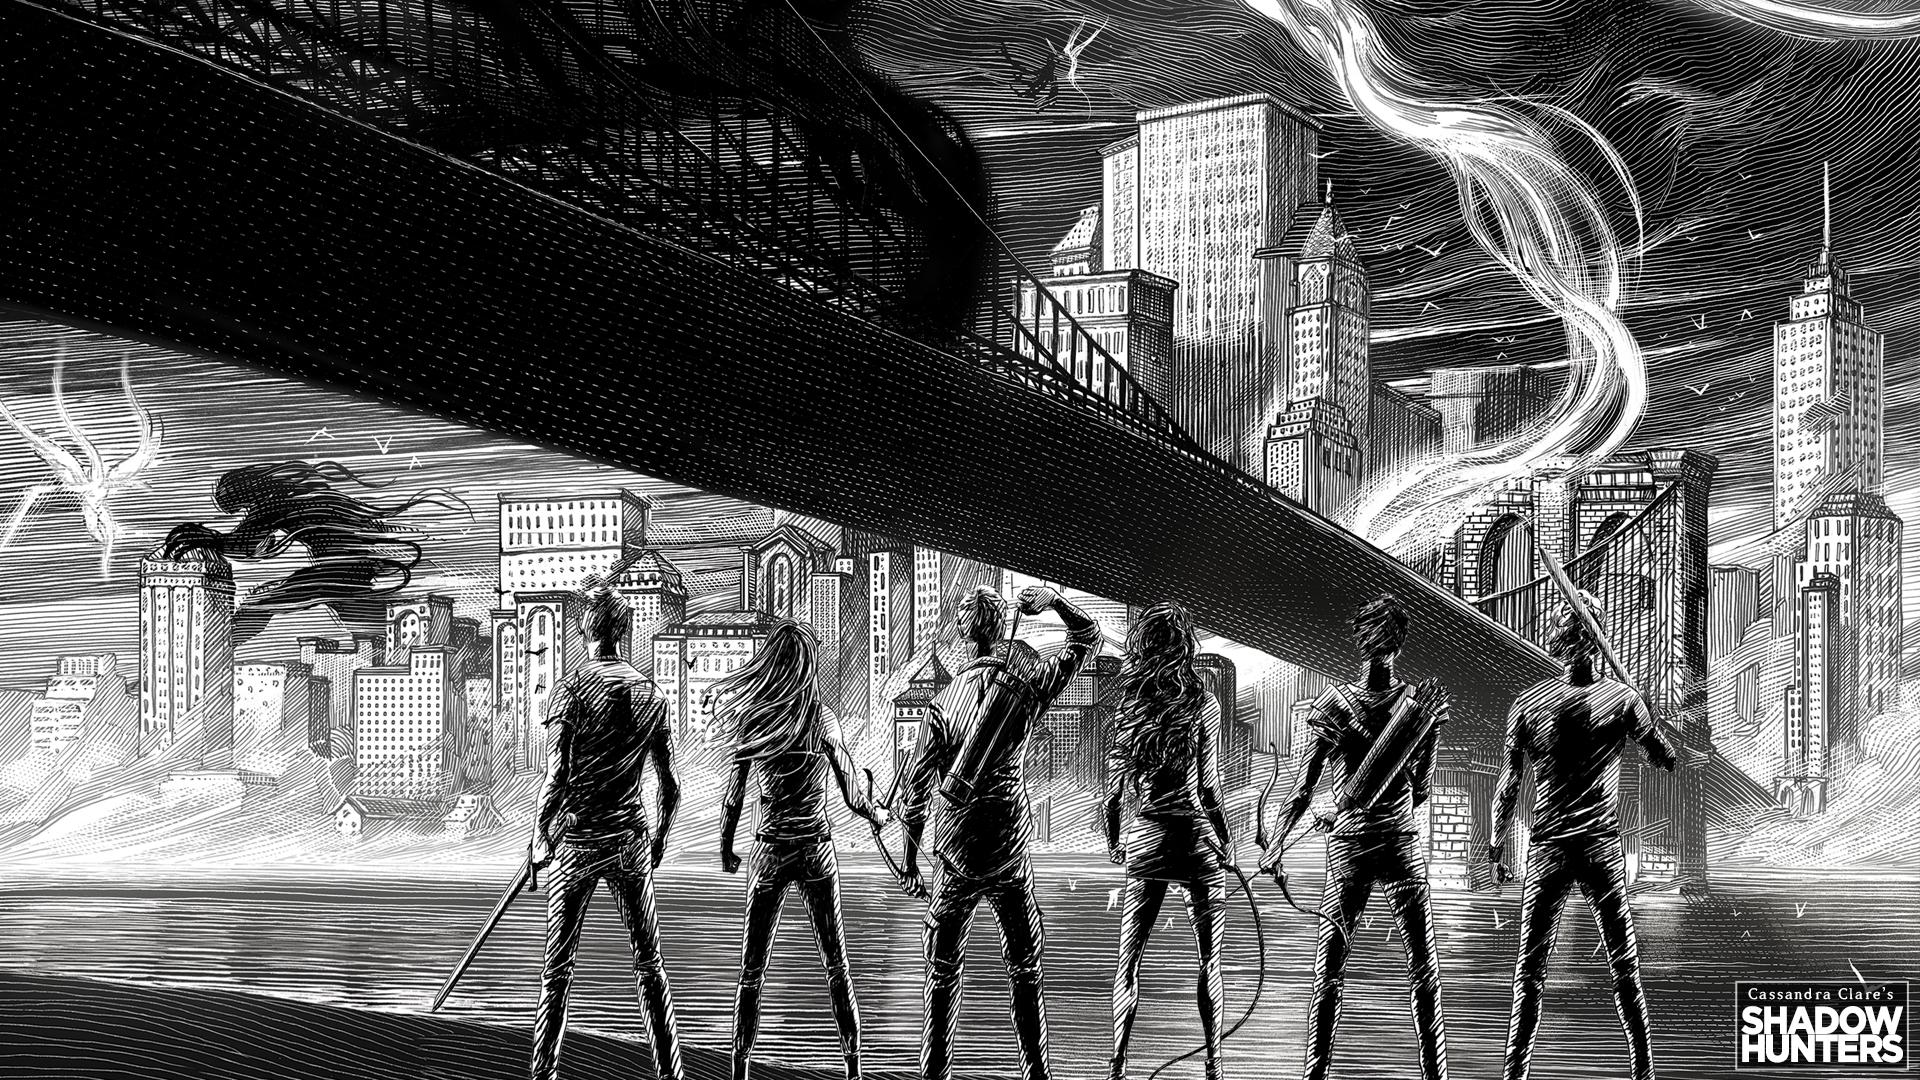 Shadowhunters Fondo De Pantalla Hd Fondo De Escritorio